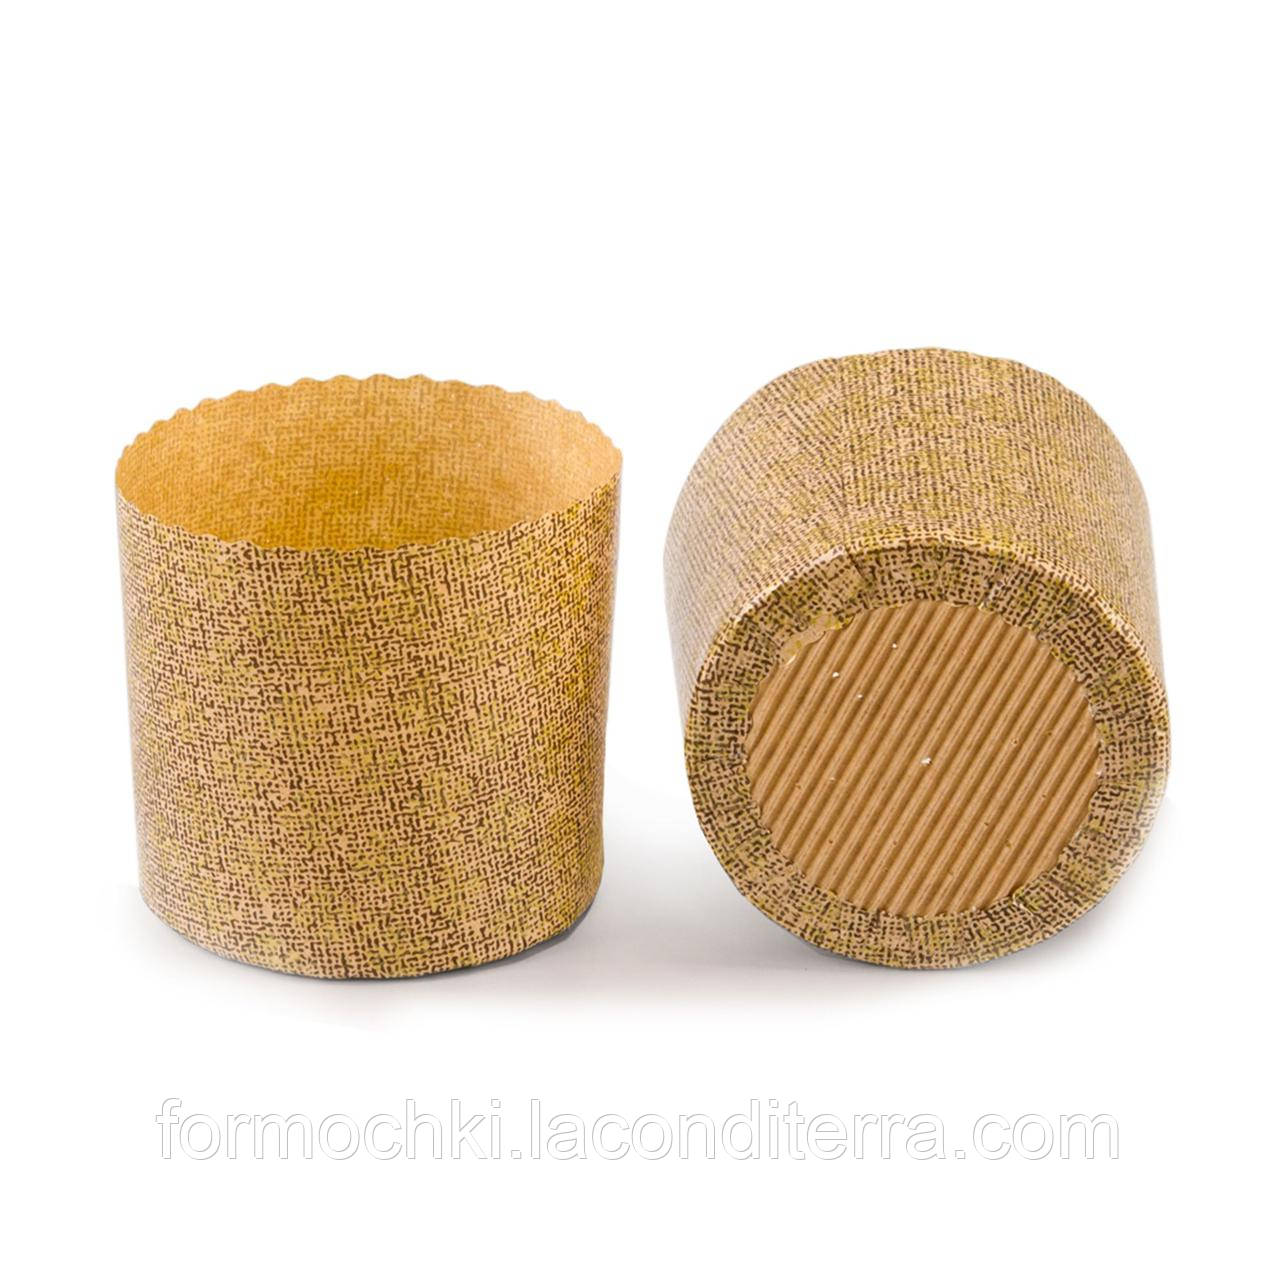 Форма для выпечки паски бумажная (134/115 мм)